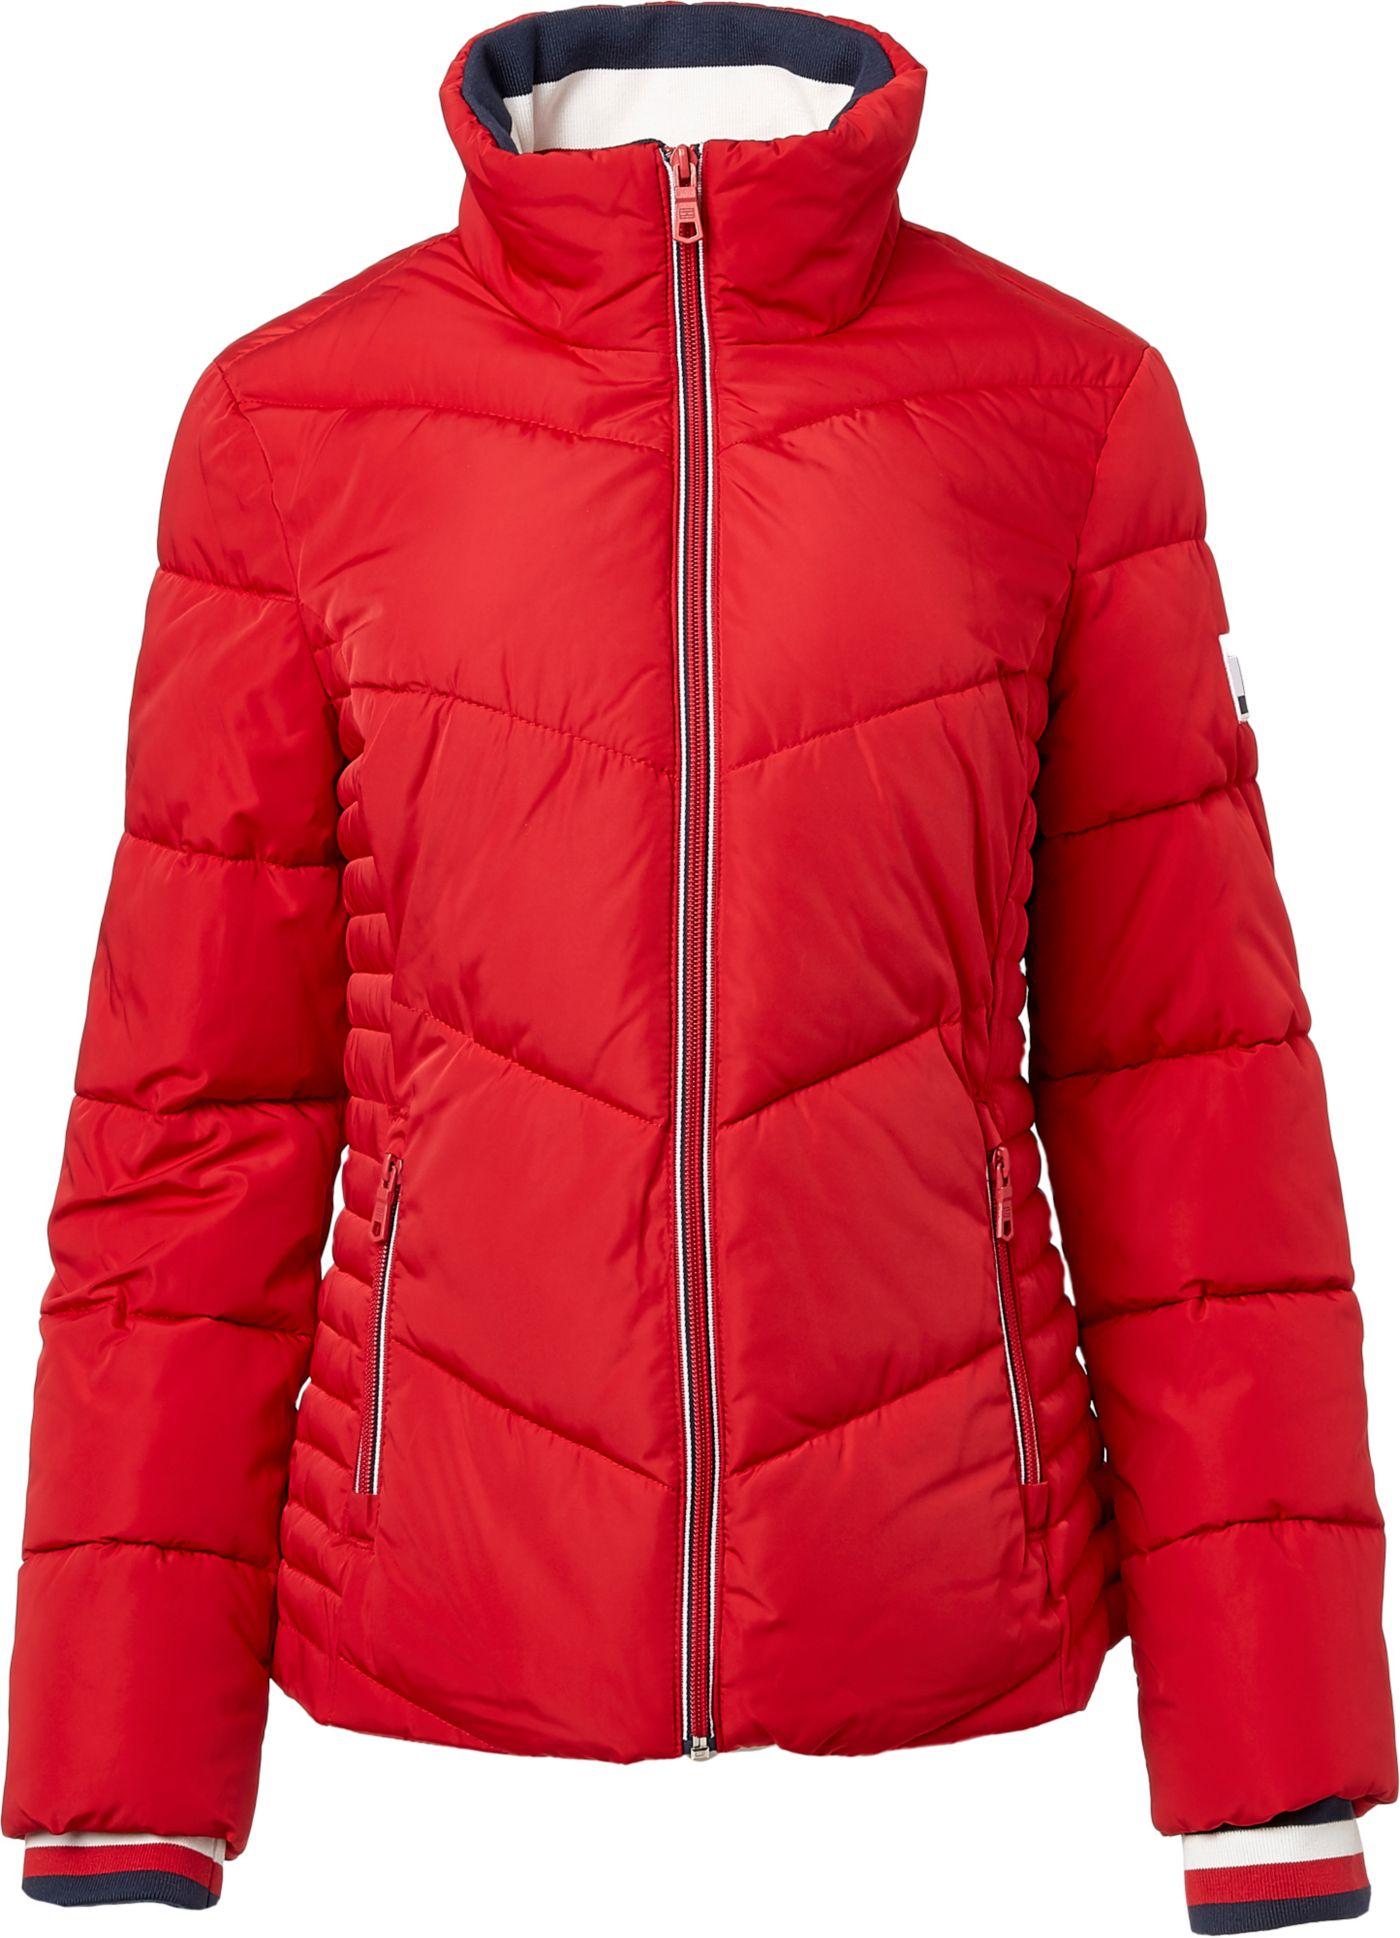 Tommy Hilfiger Women's Chevron Puffer Jacket